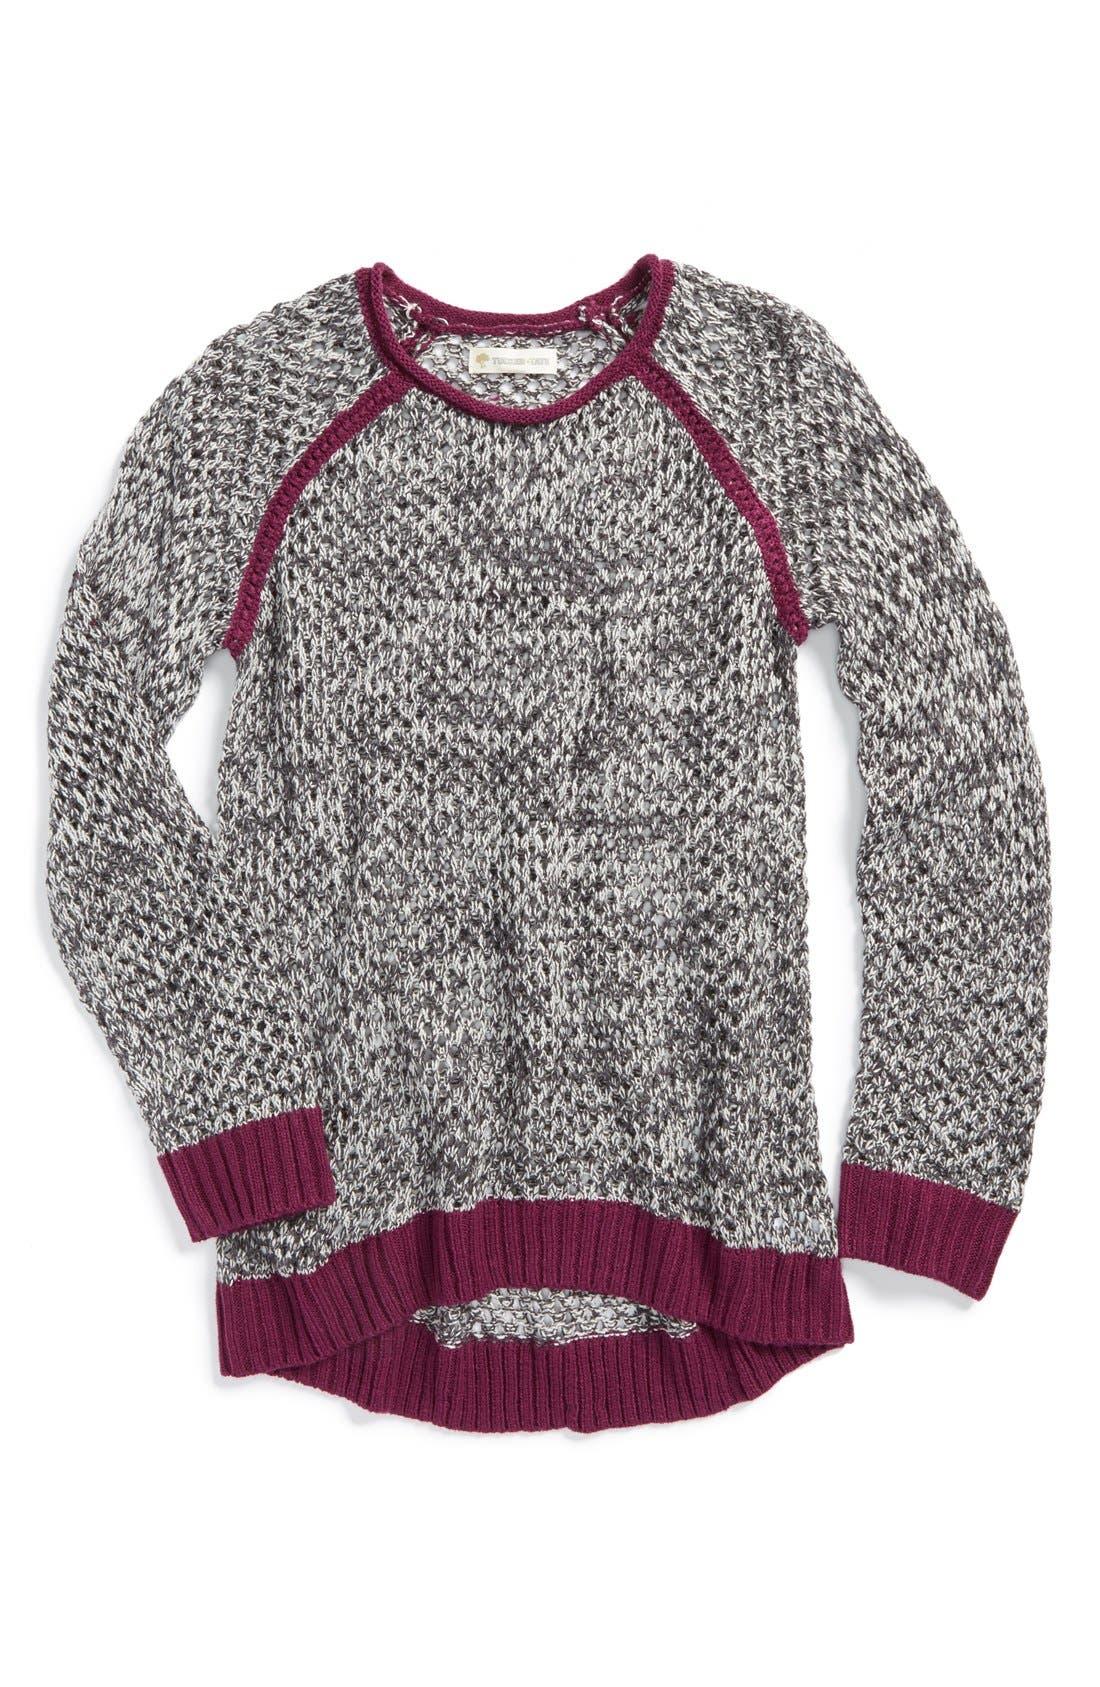 Alternate Image 1 Selected - Tucker + Tate 'Lucia' Raglan Sleeve Sweater (Big Girls)